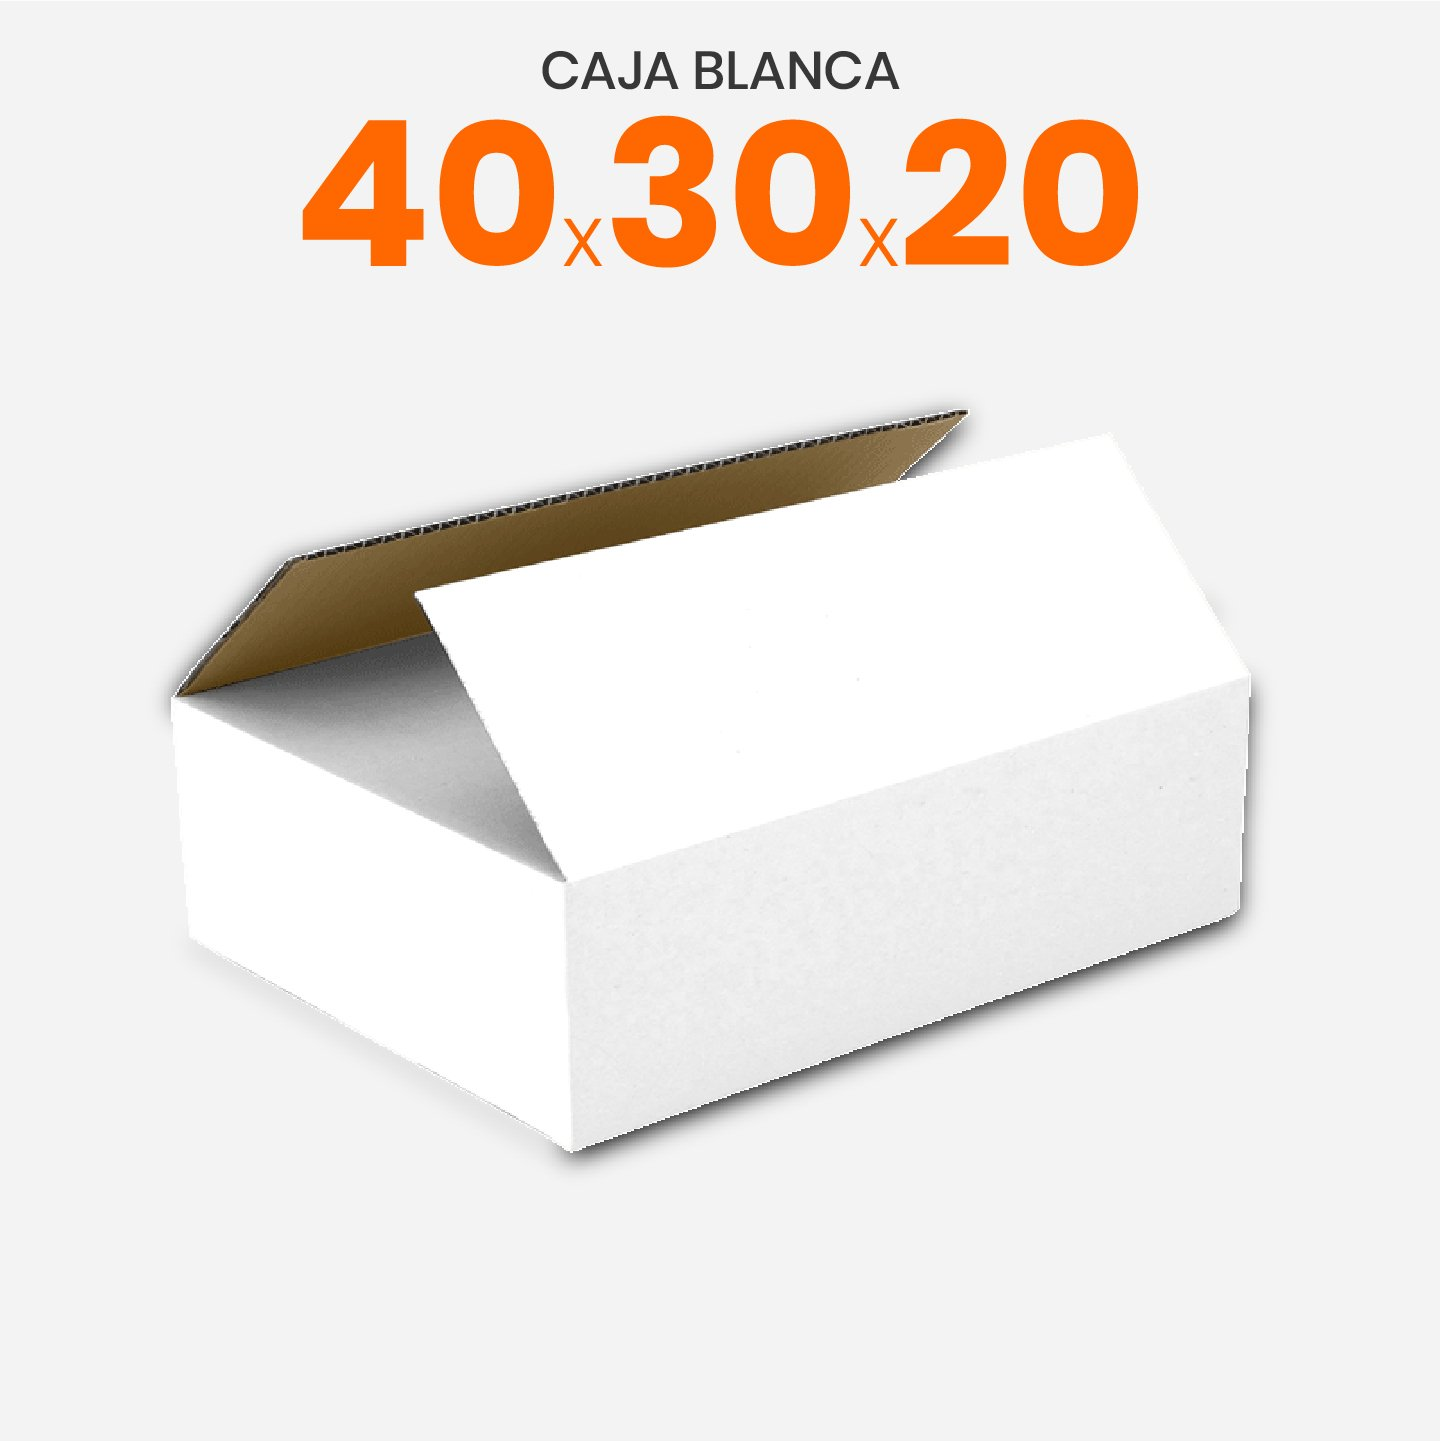 Caja De Cartón Corrugado Blanca 40x30x20